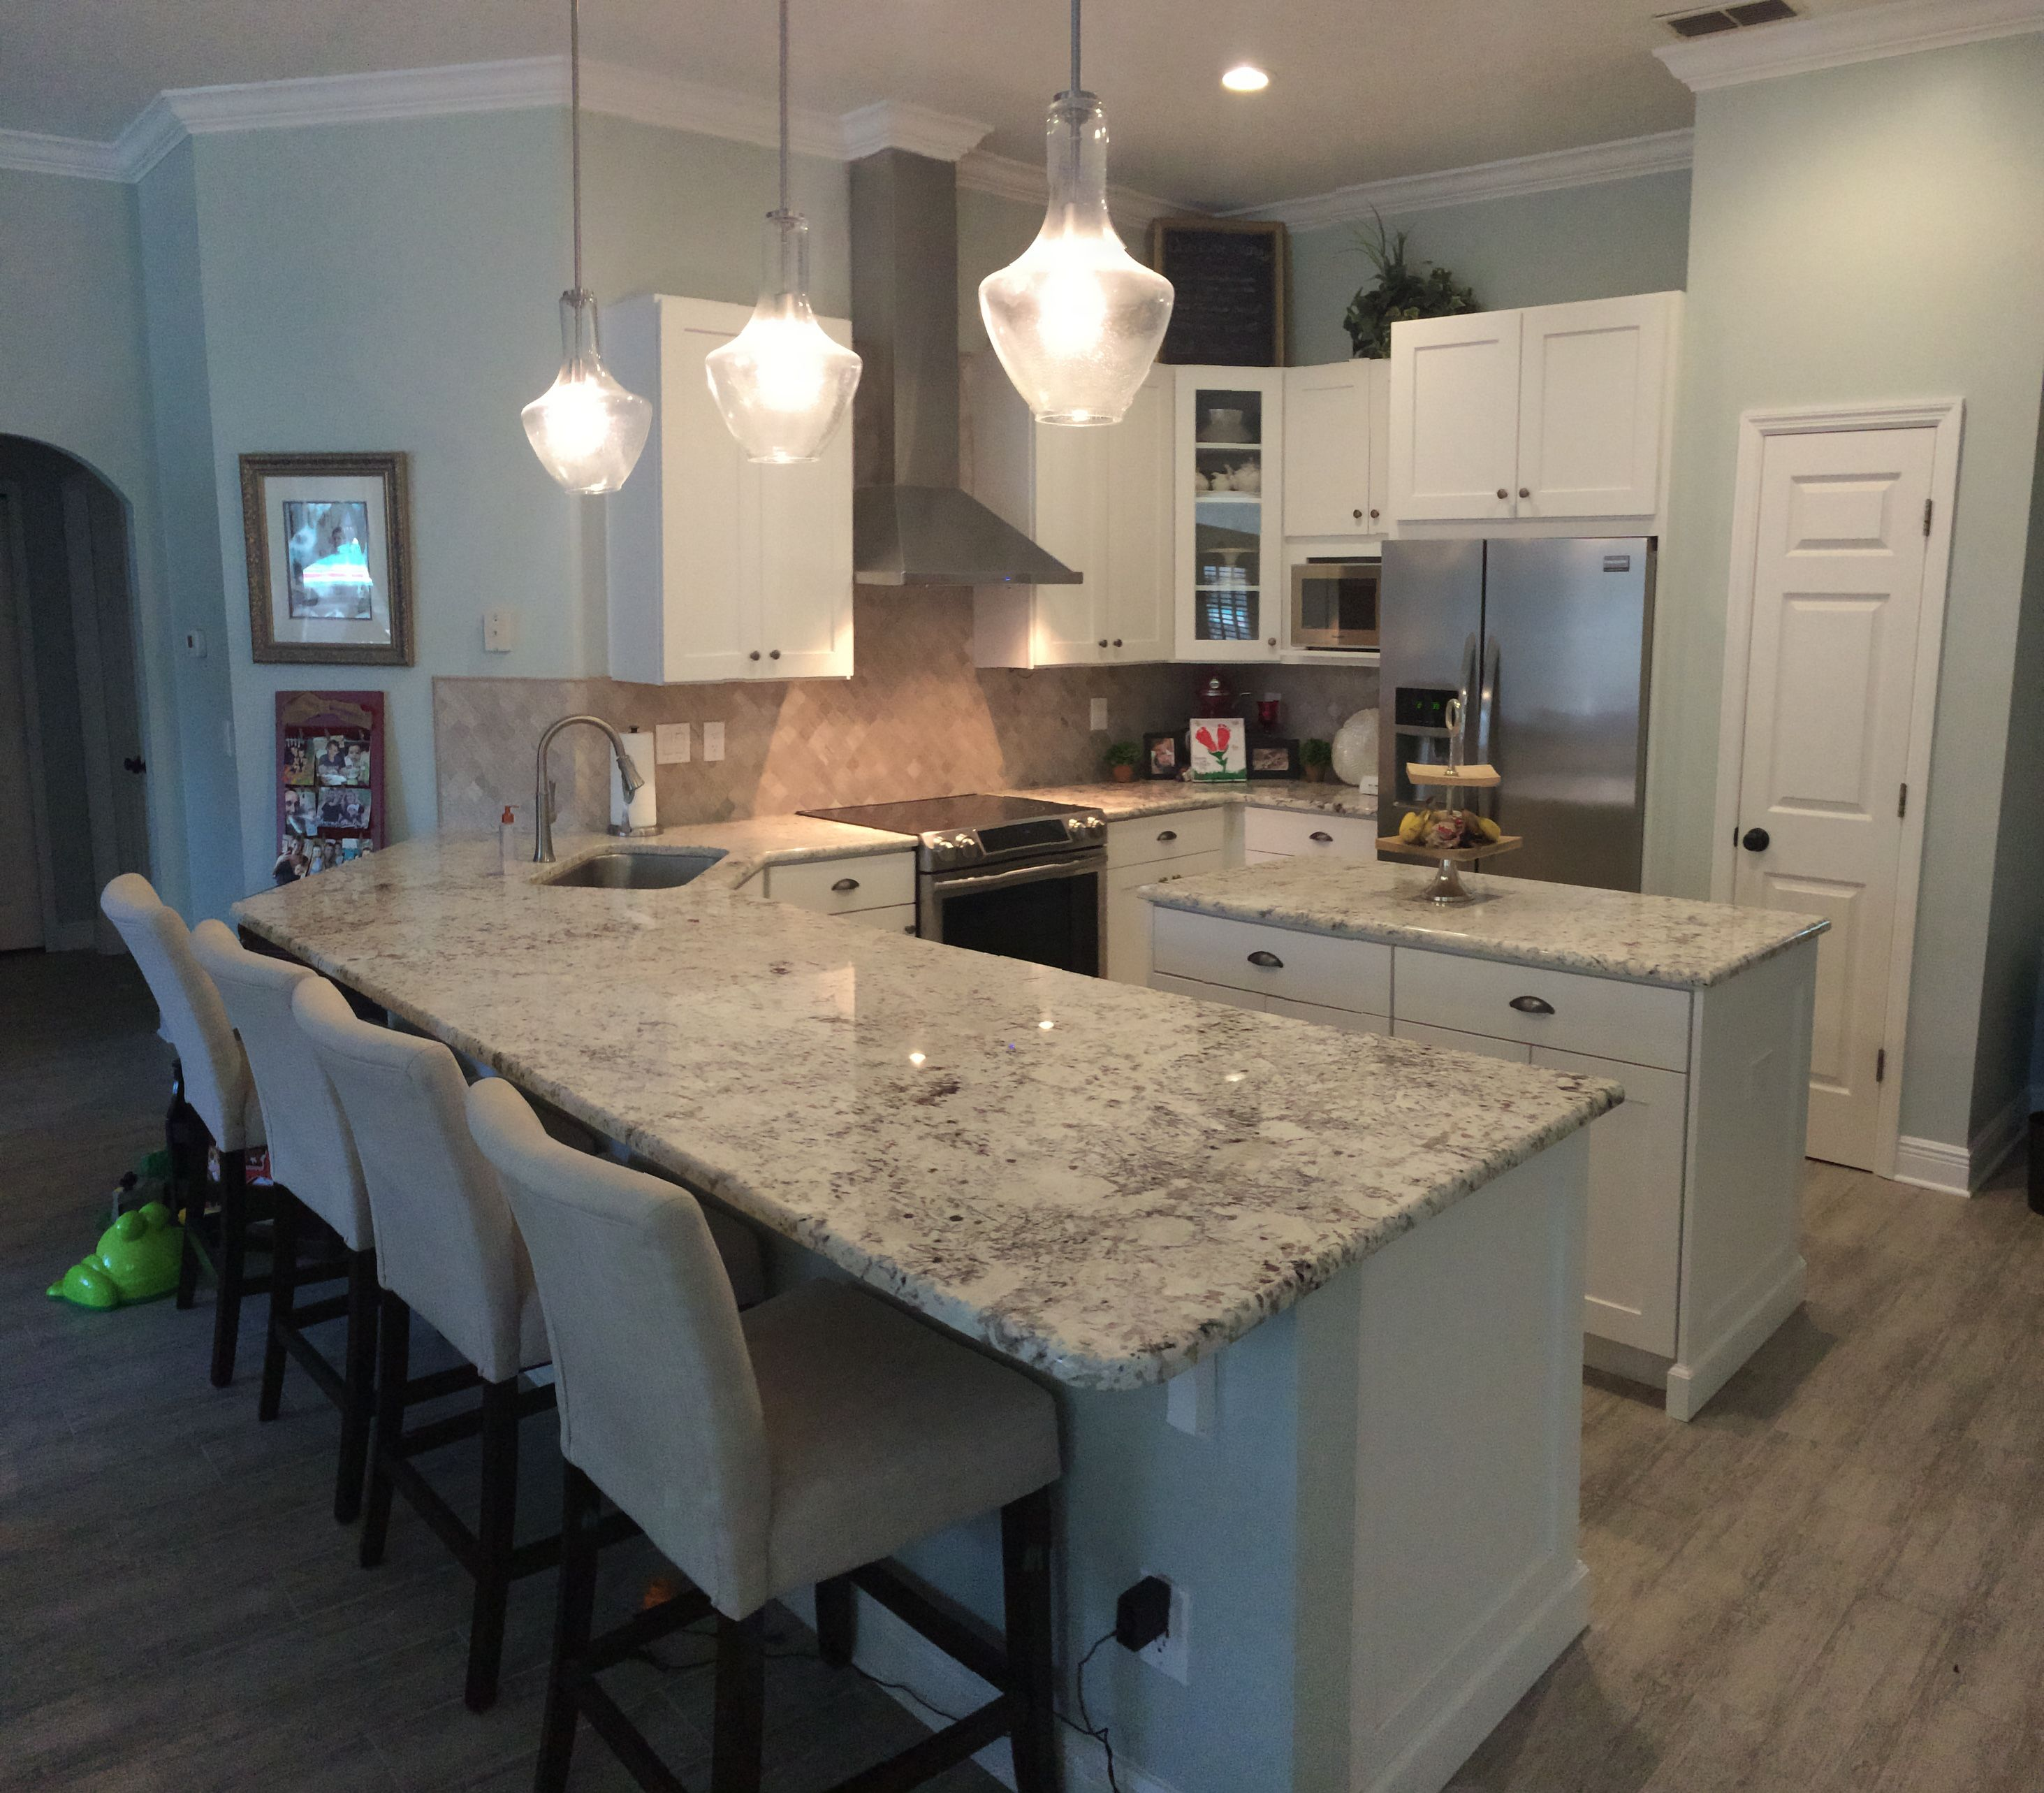 White Galaxy Granite Kitchen: White Galaxy Granite, Shaker Cabinets, California Bar